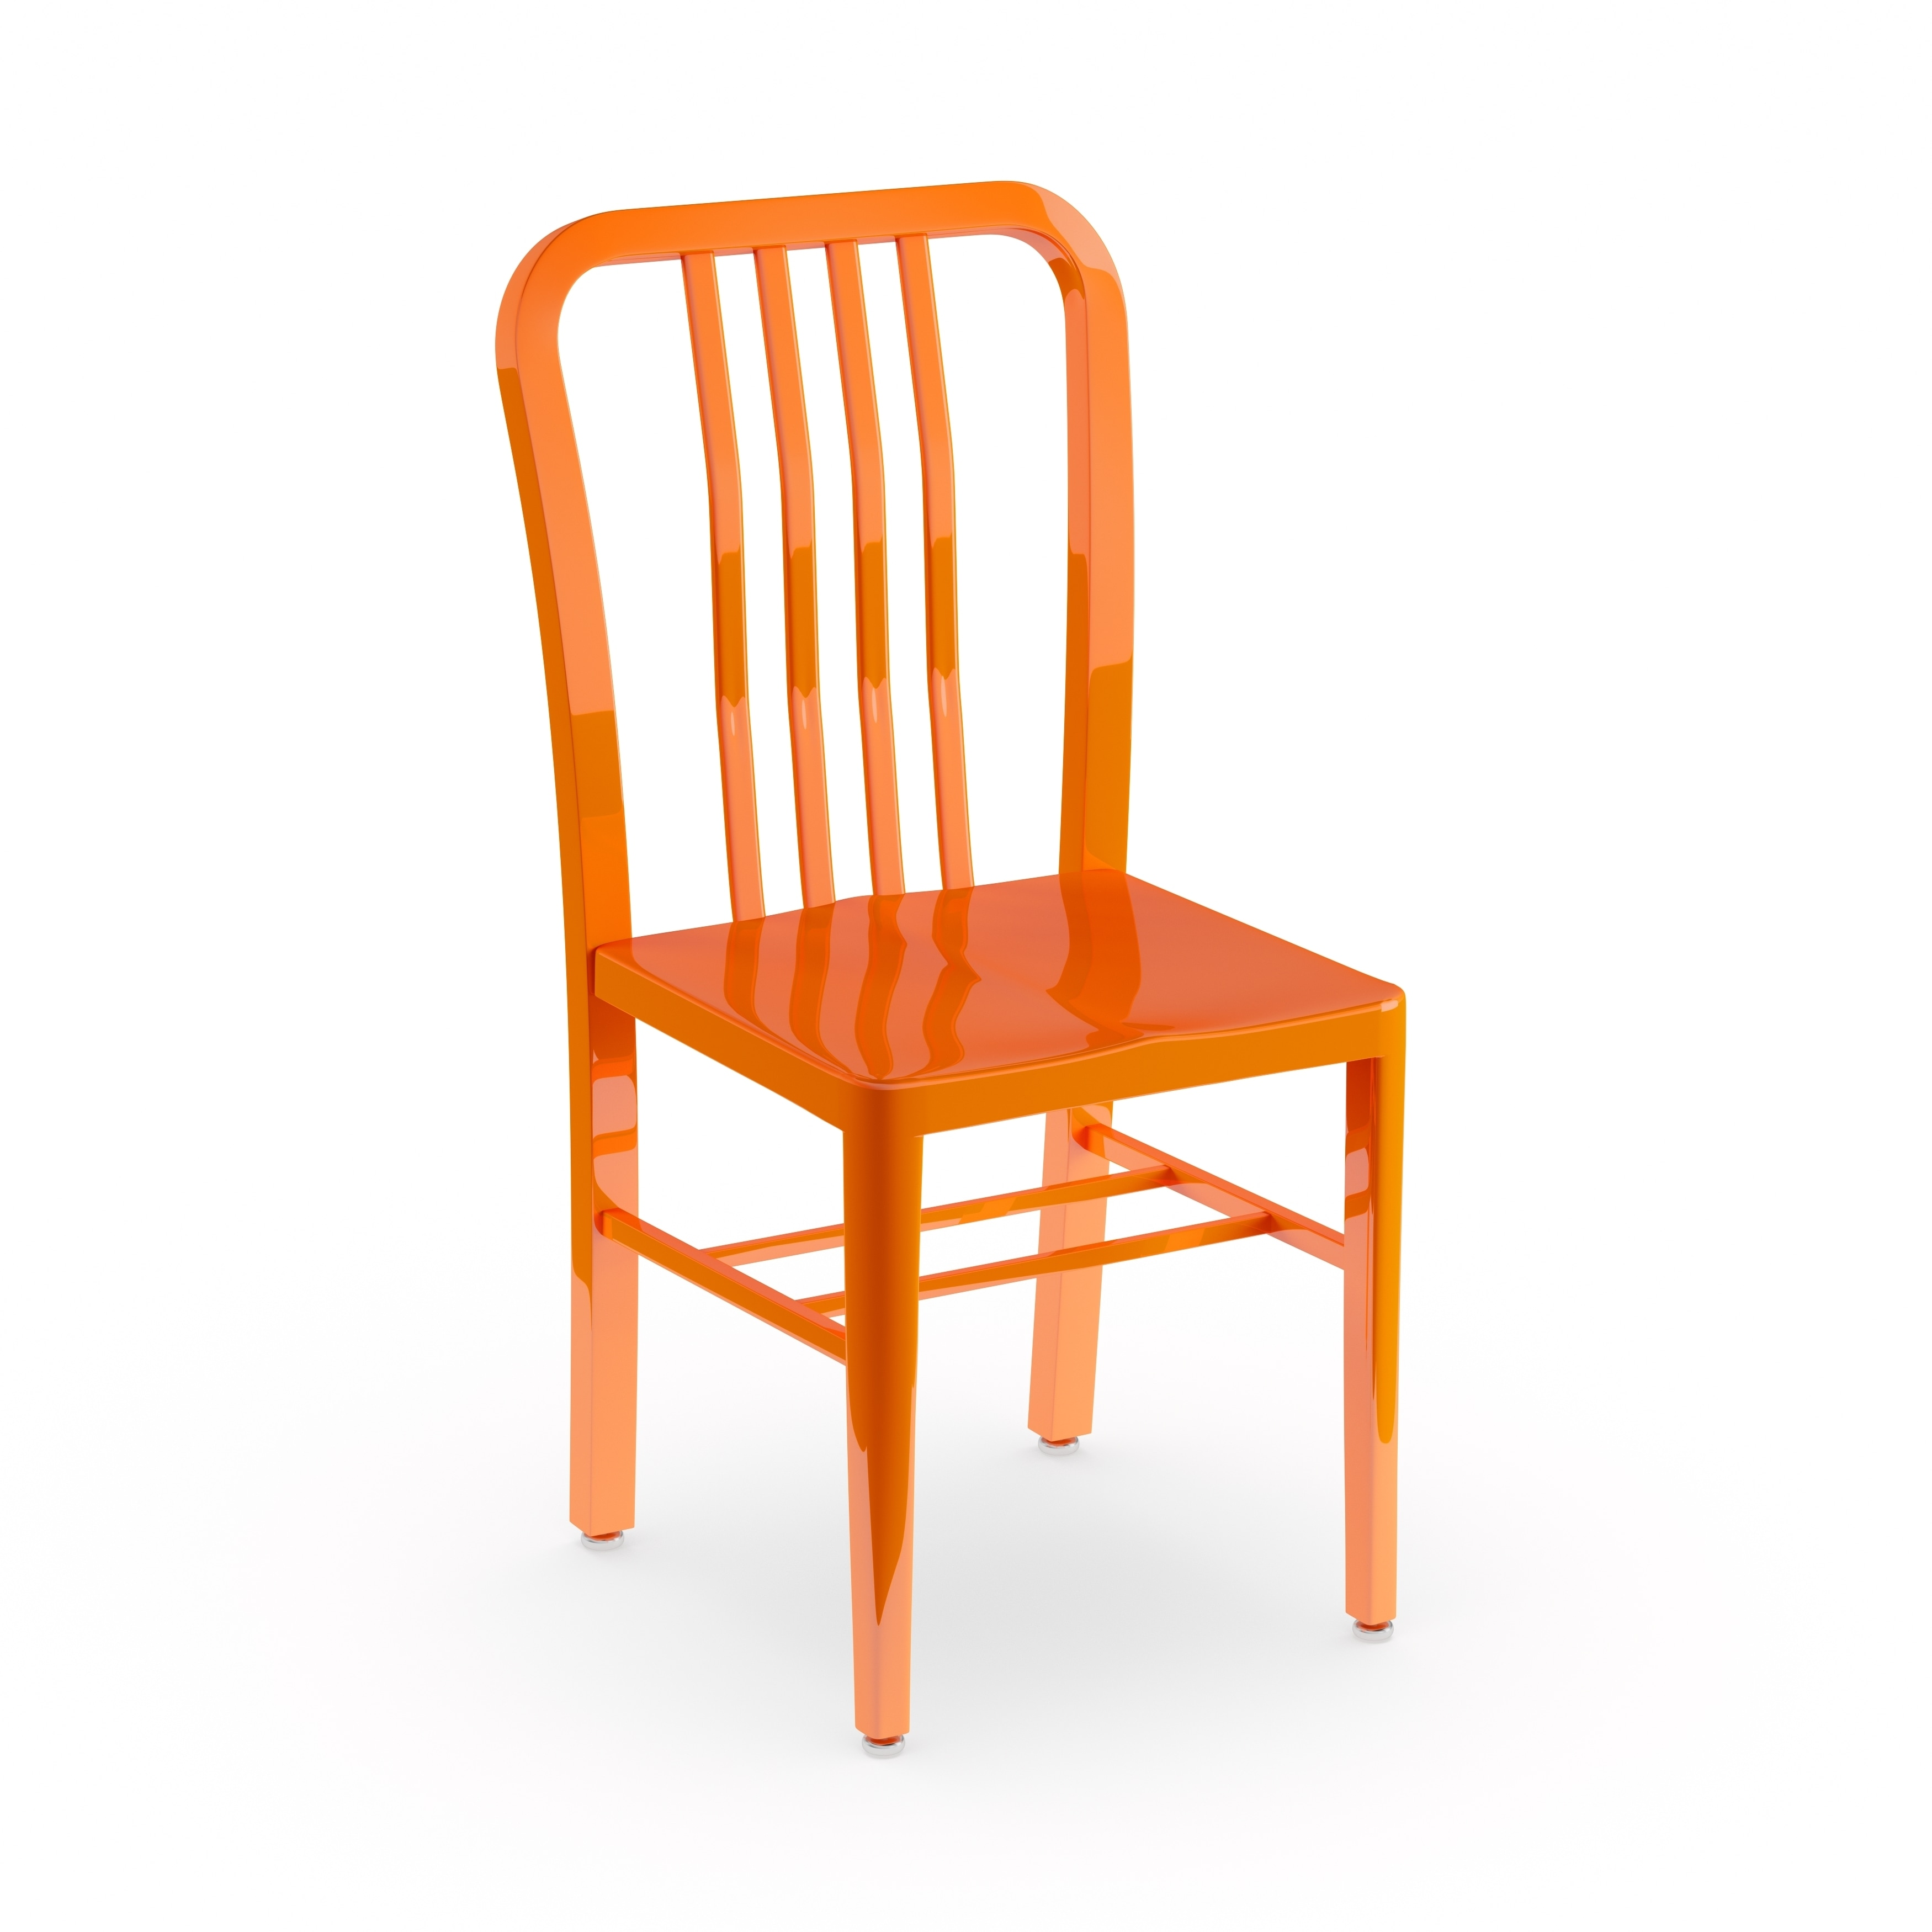 Wondrous Porch Den Stonehurst Stoneford Metal Indoor Outdoor Chair Dailytribune Chair Design For Home Dailytribuneorg